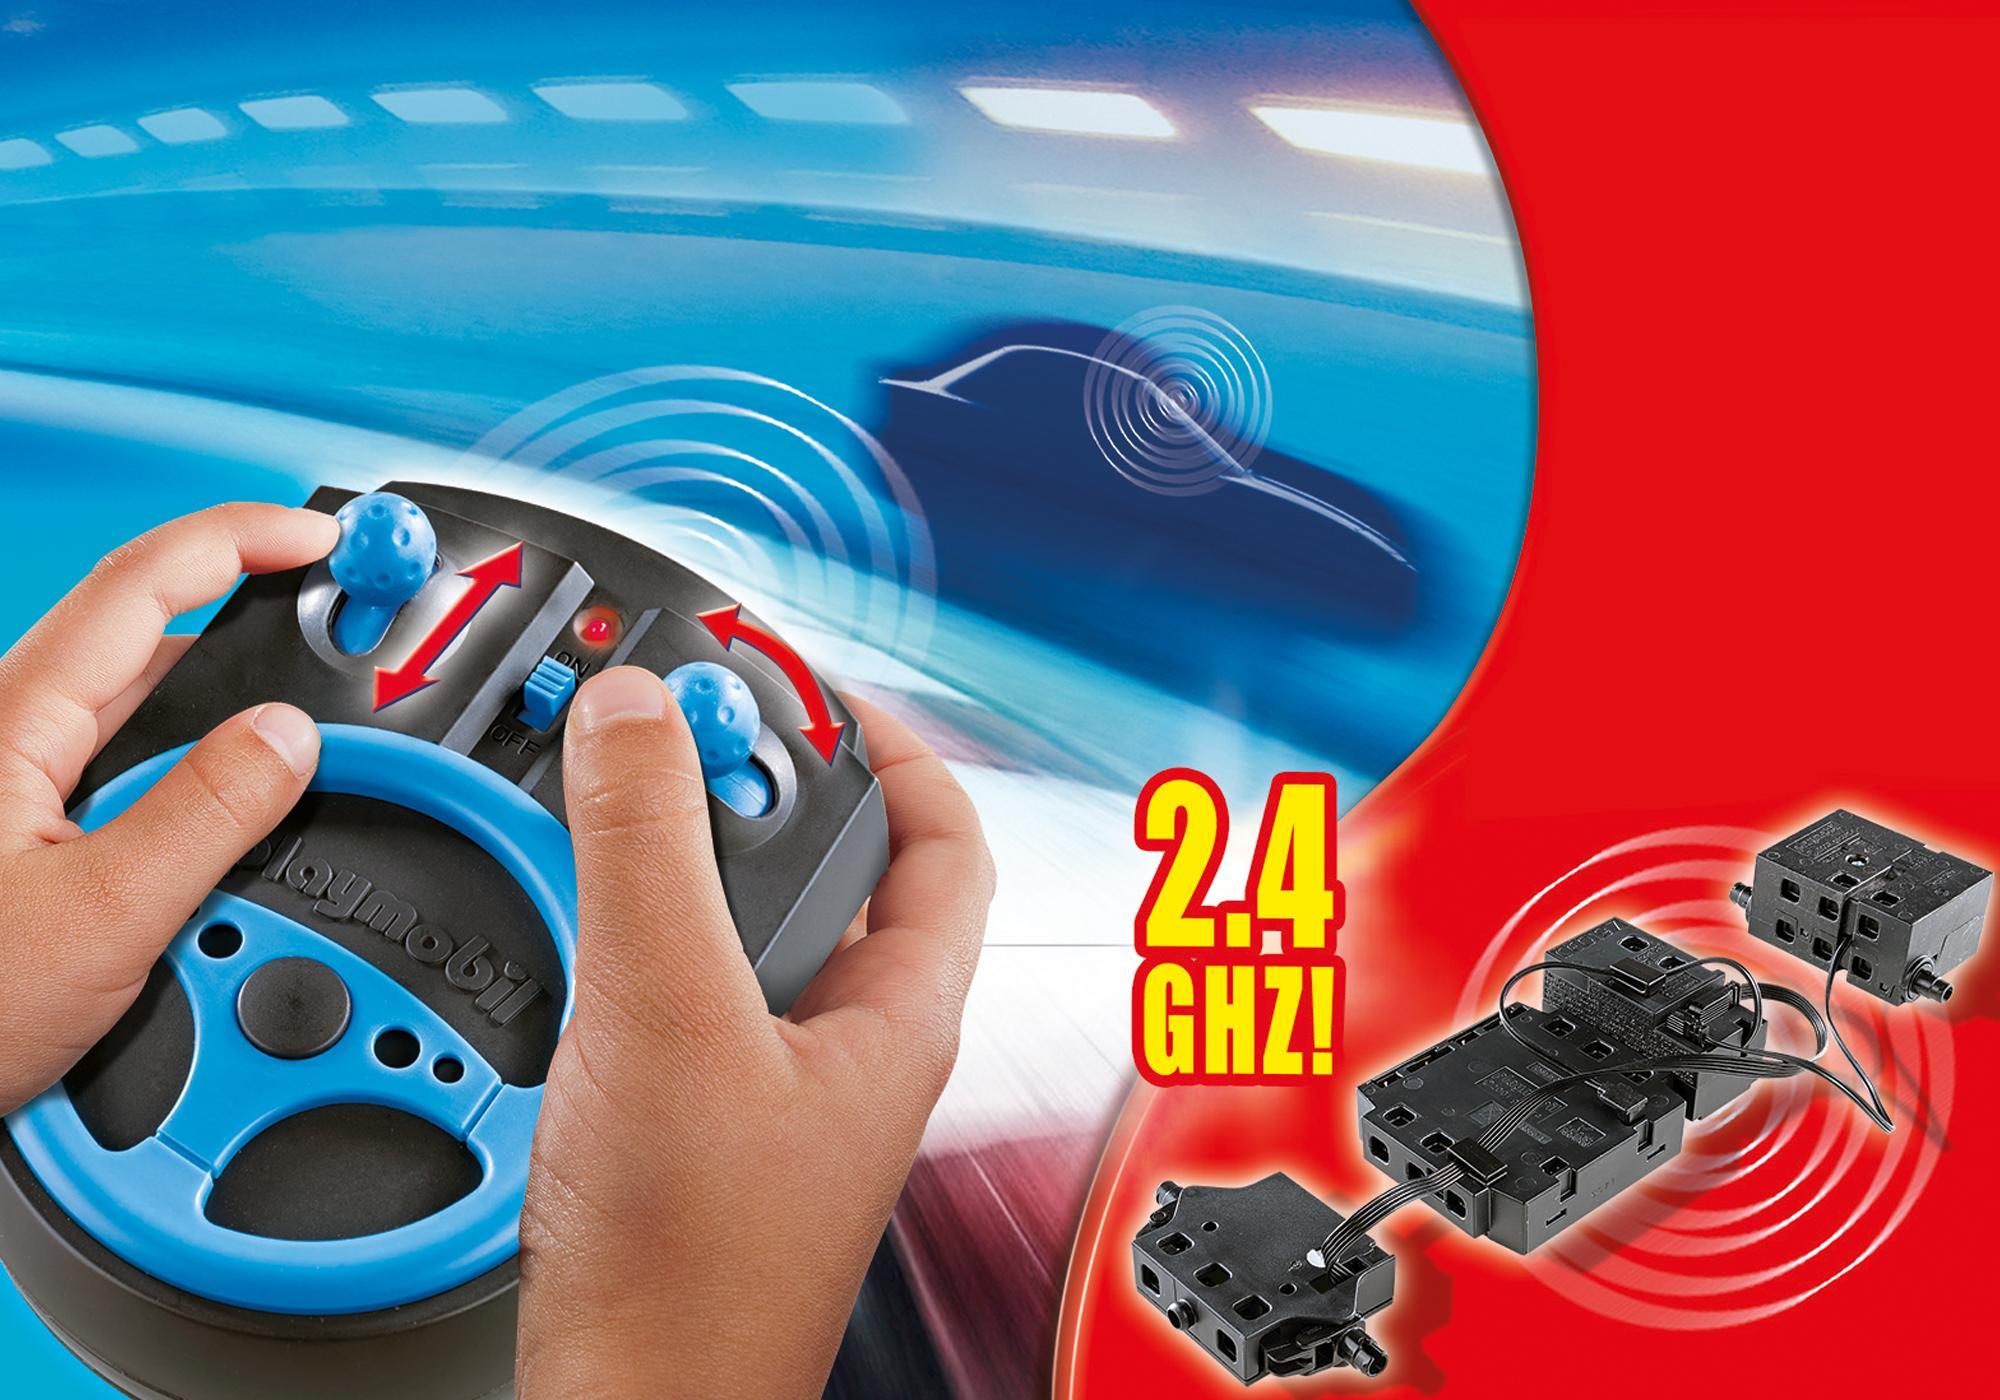 http://media.playmobil.com/i/playmobil/6914_product_detail/Remote Control Set 2.4GHz